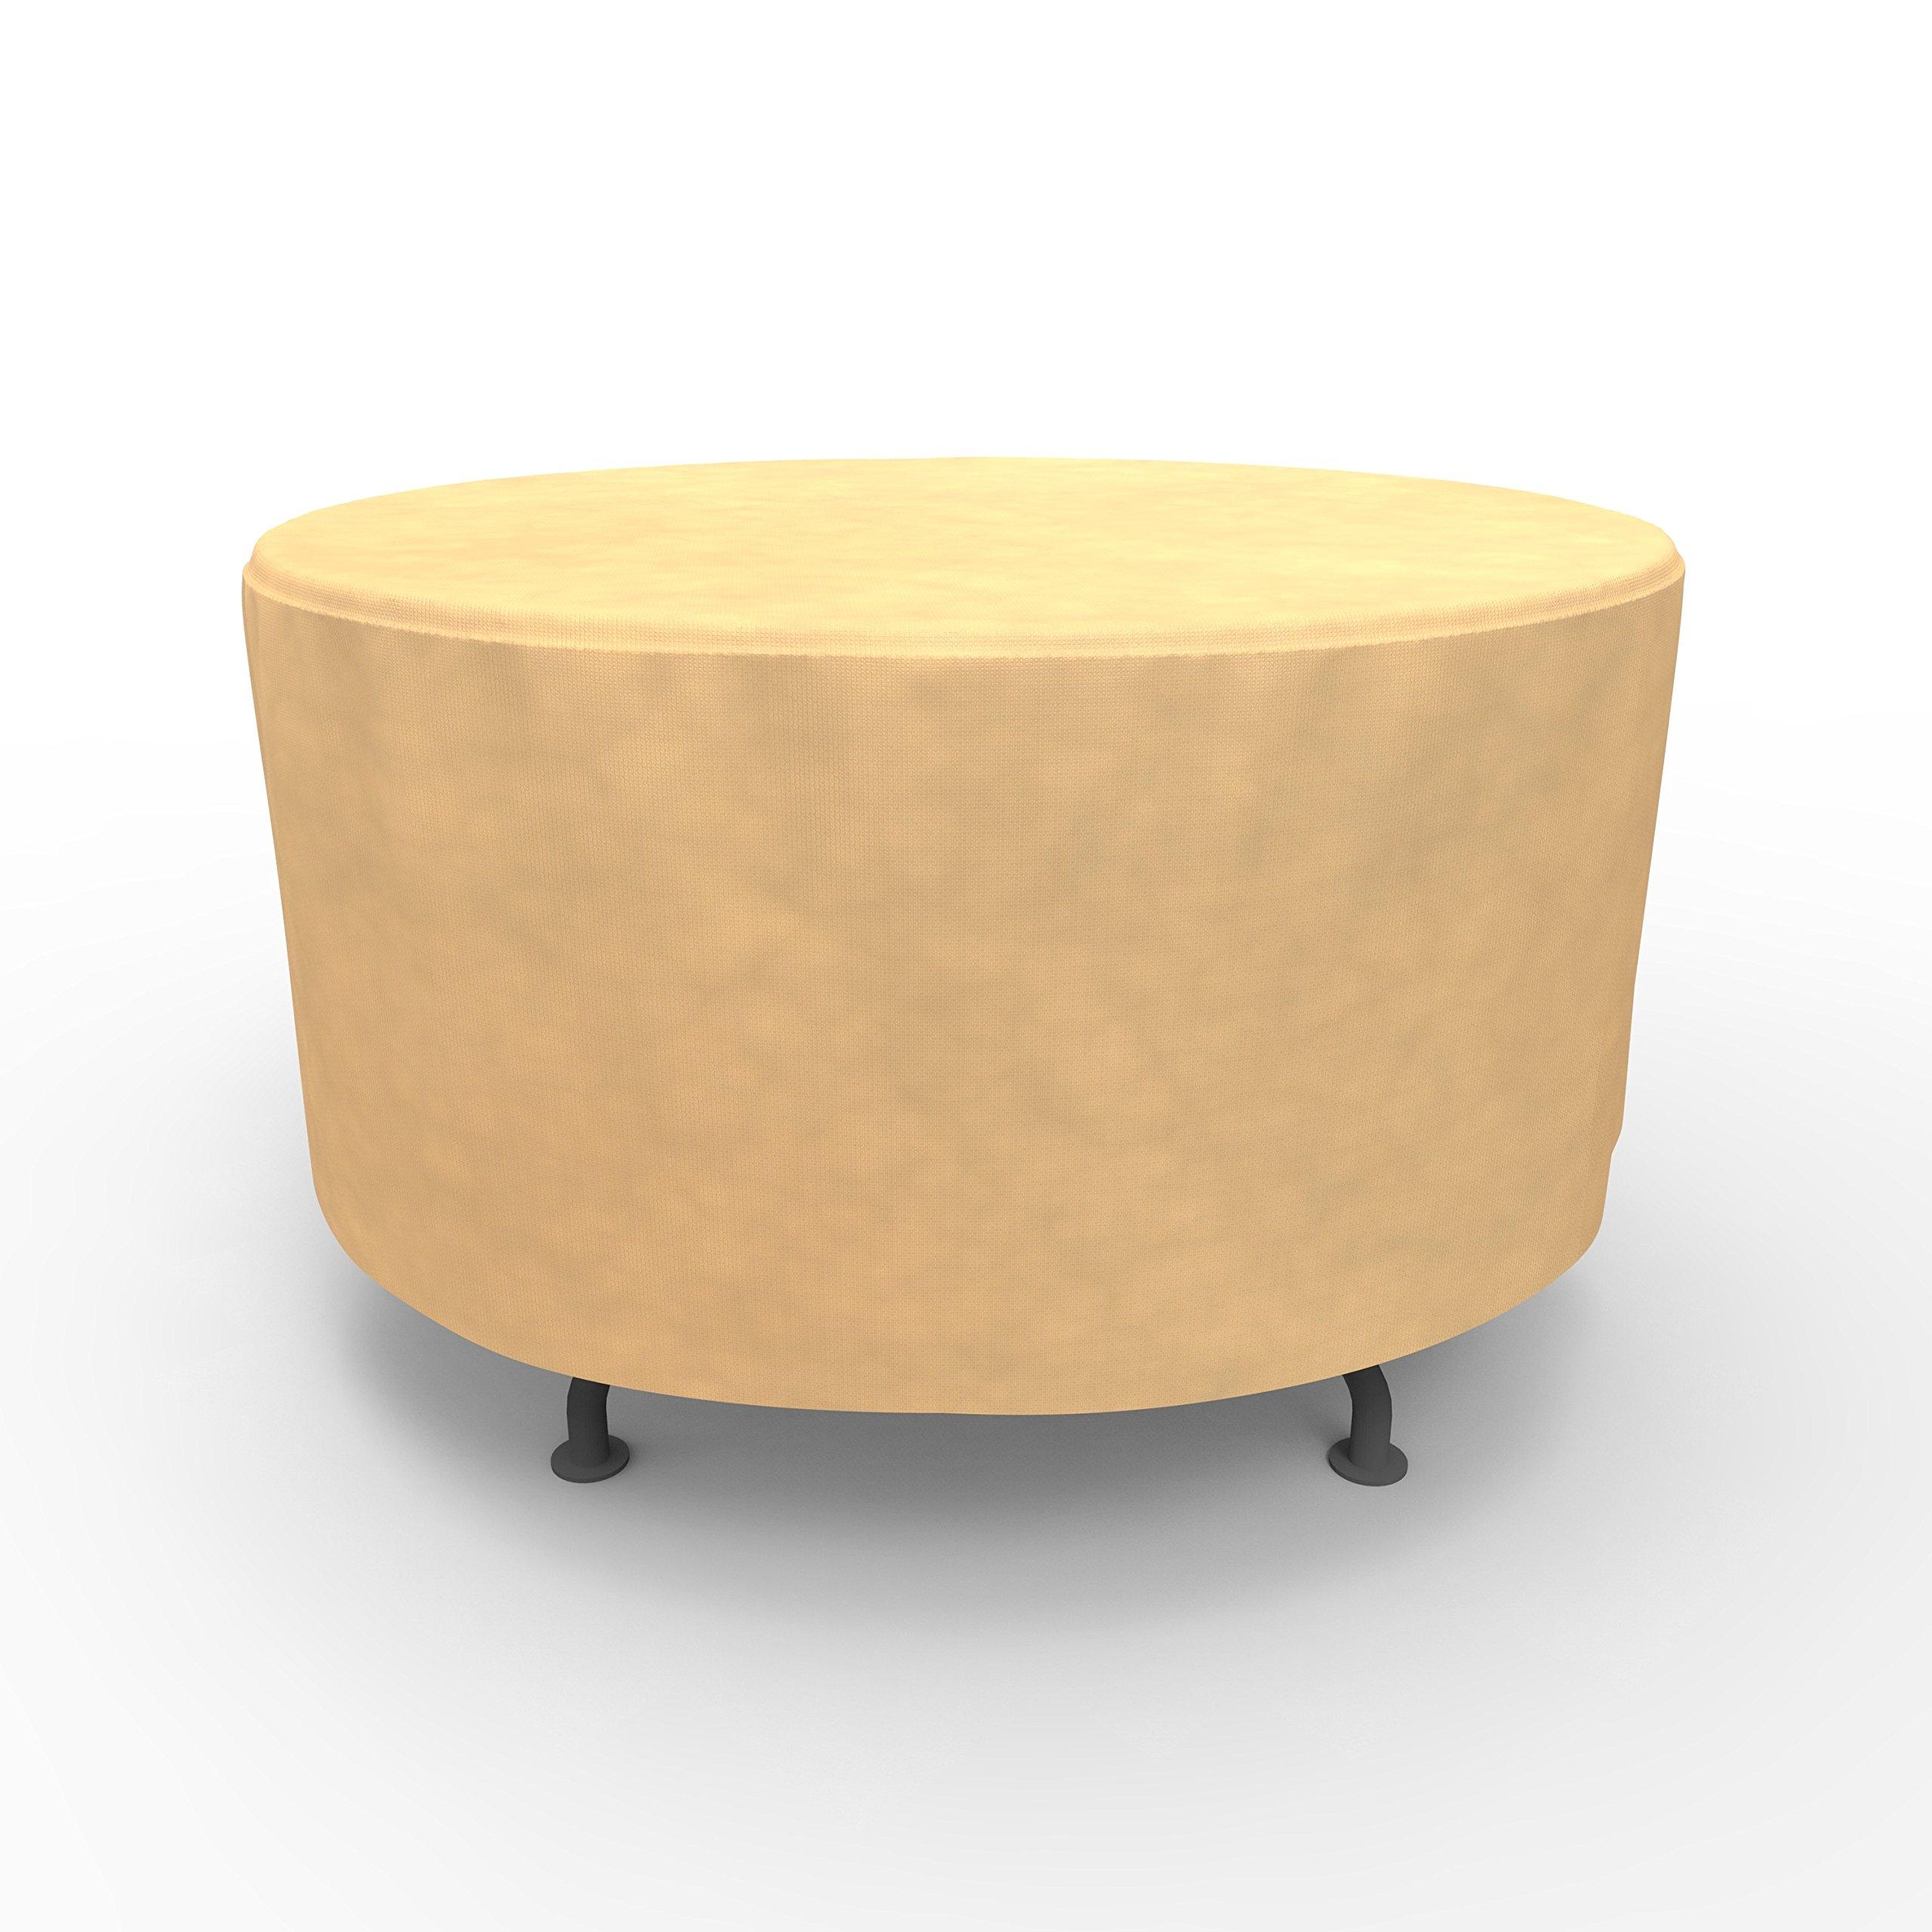 EmpirePatio Round Table Covers 48 in Diameter - Nutmeg